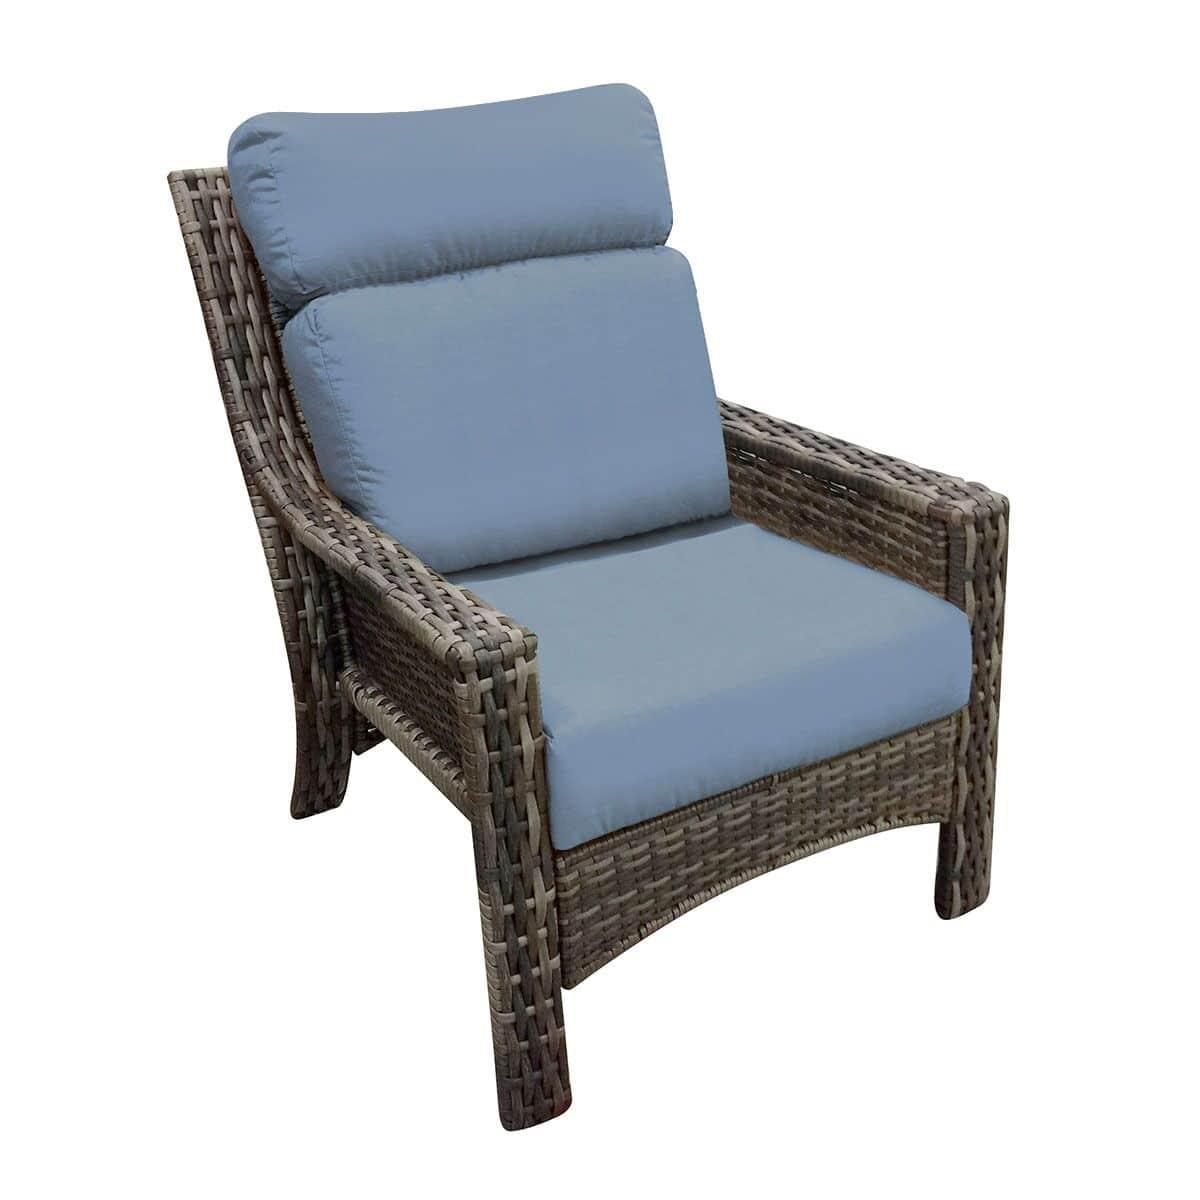 Oakleaf Outdoor Patio Furniture Set Patiohq